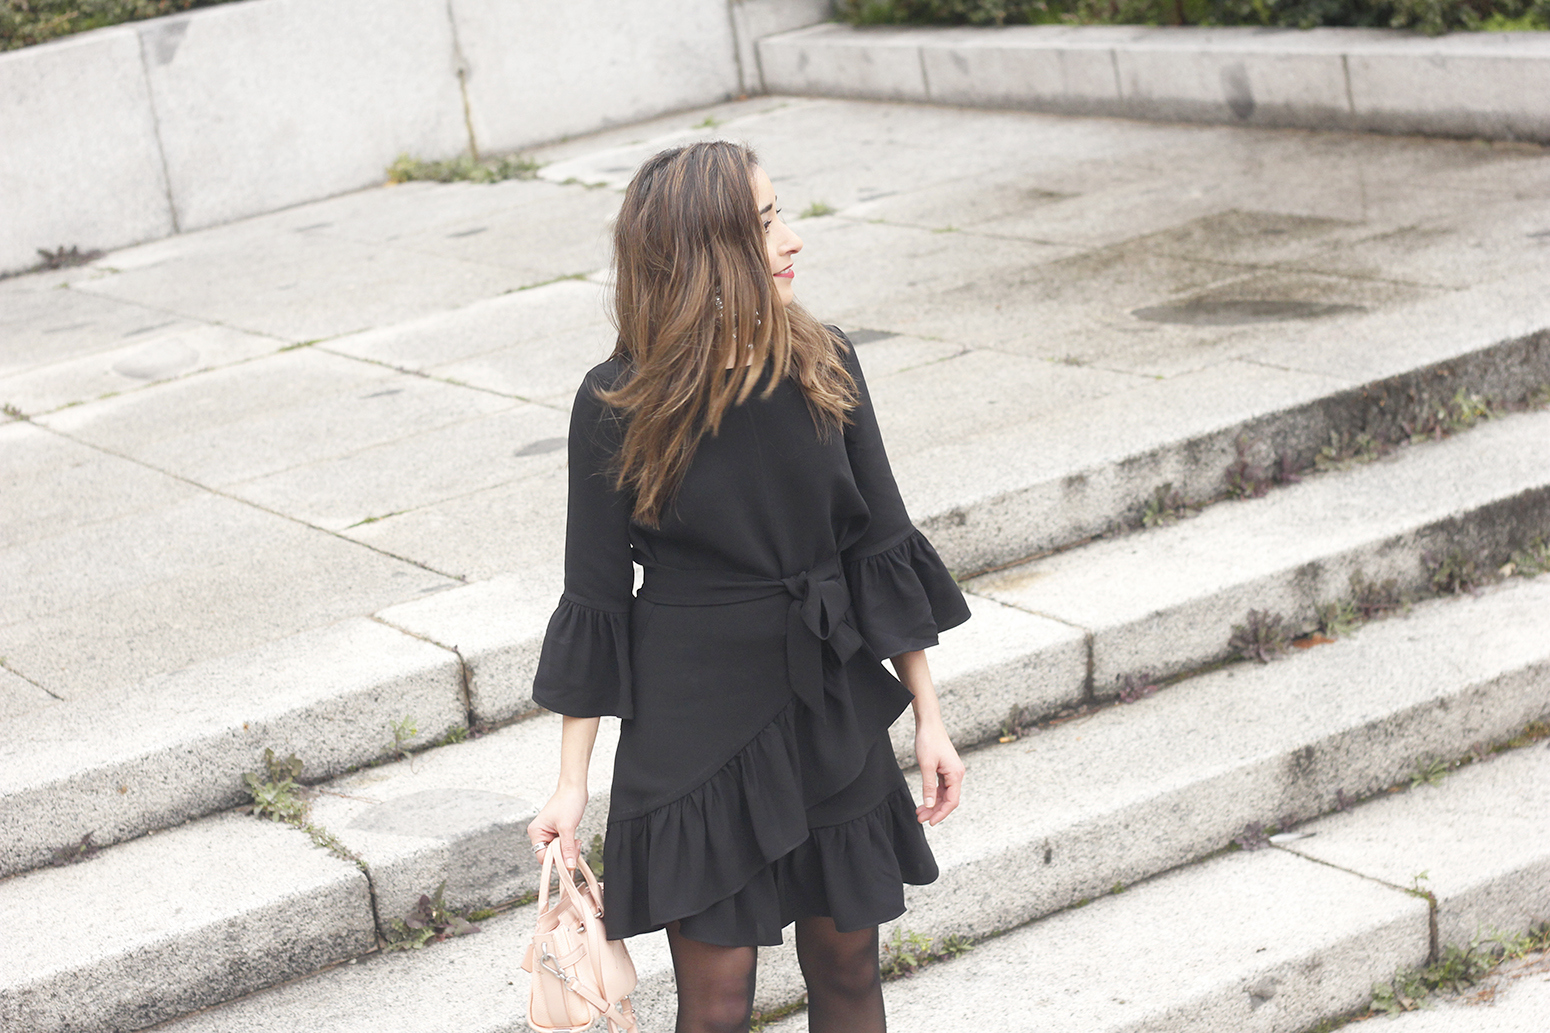 big earrings uterqüe black dress ruffles black heels style fashion outfit winter08